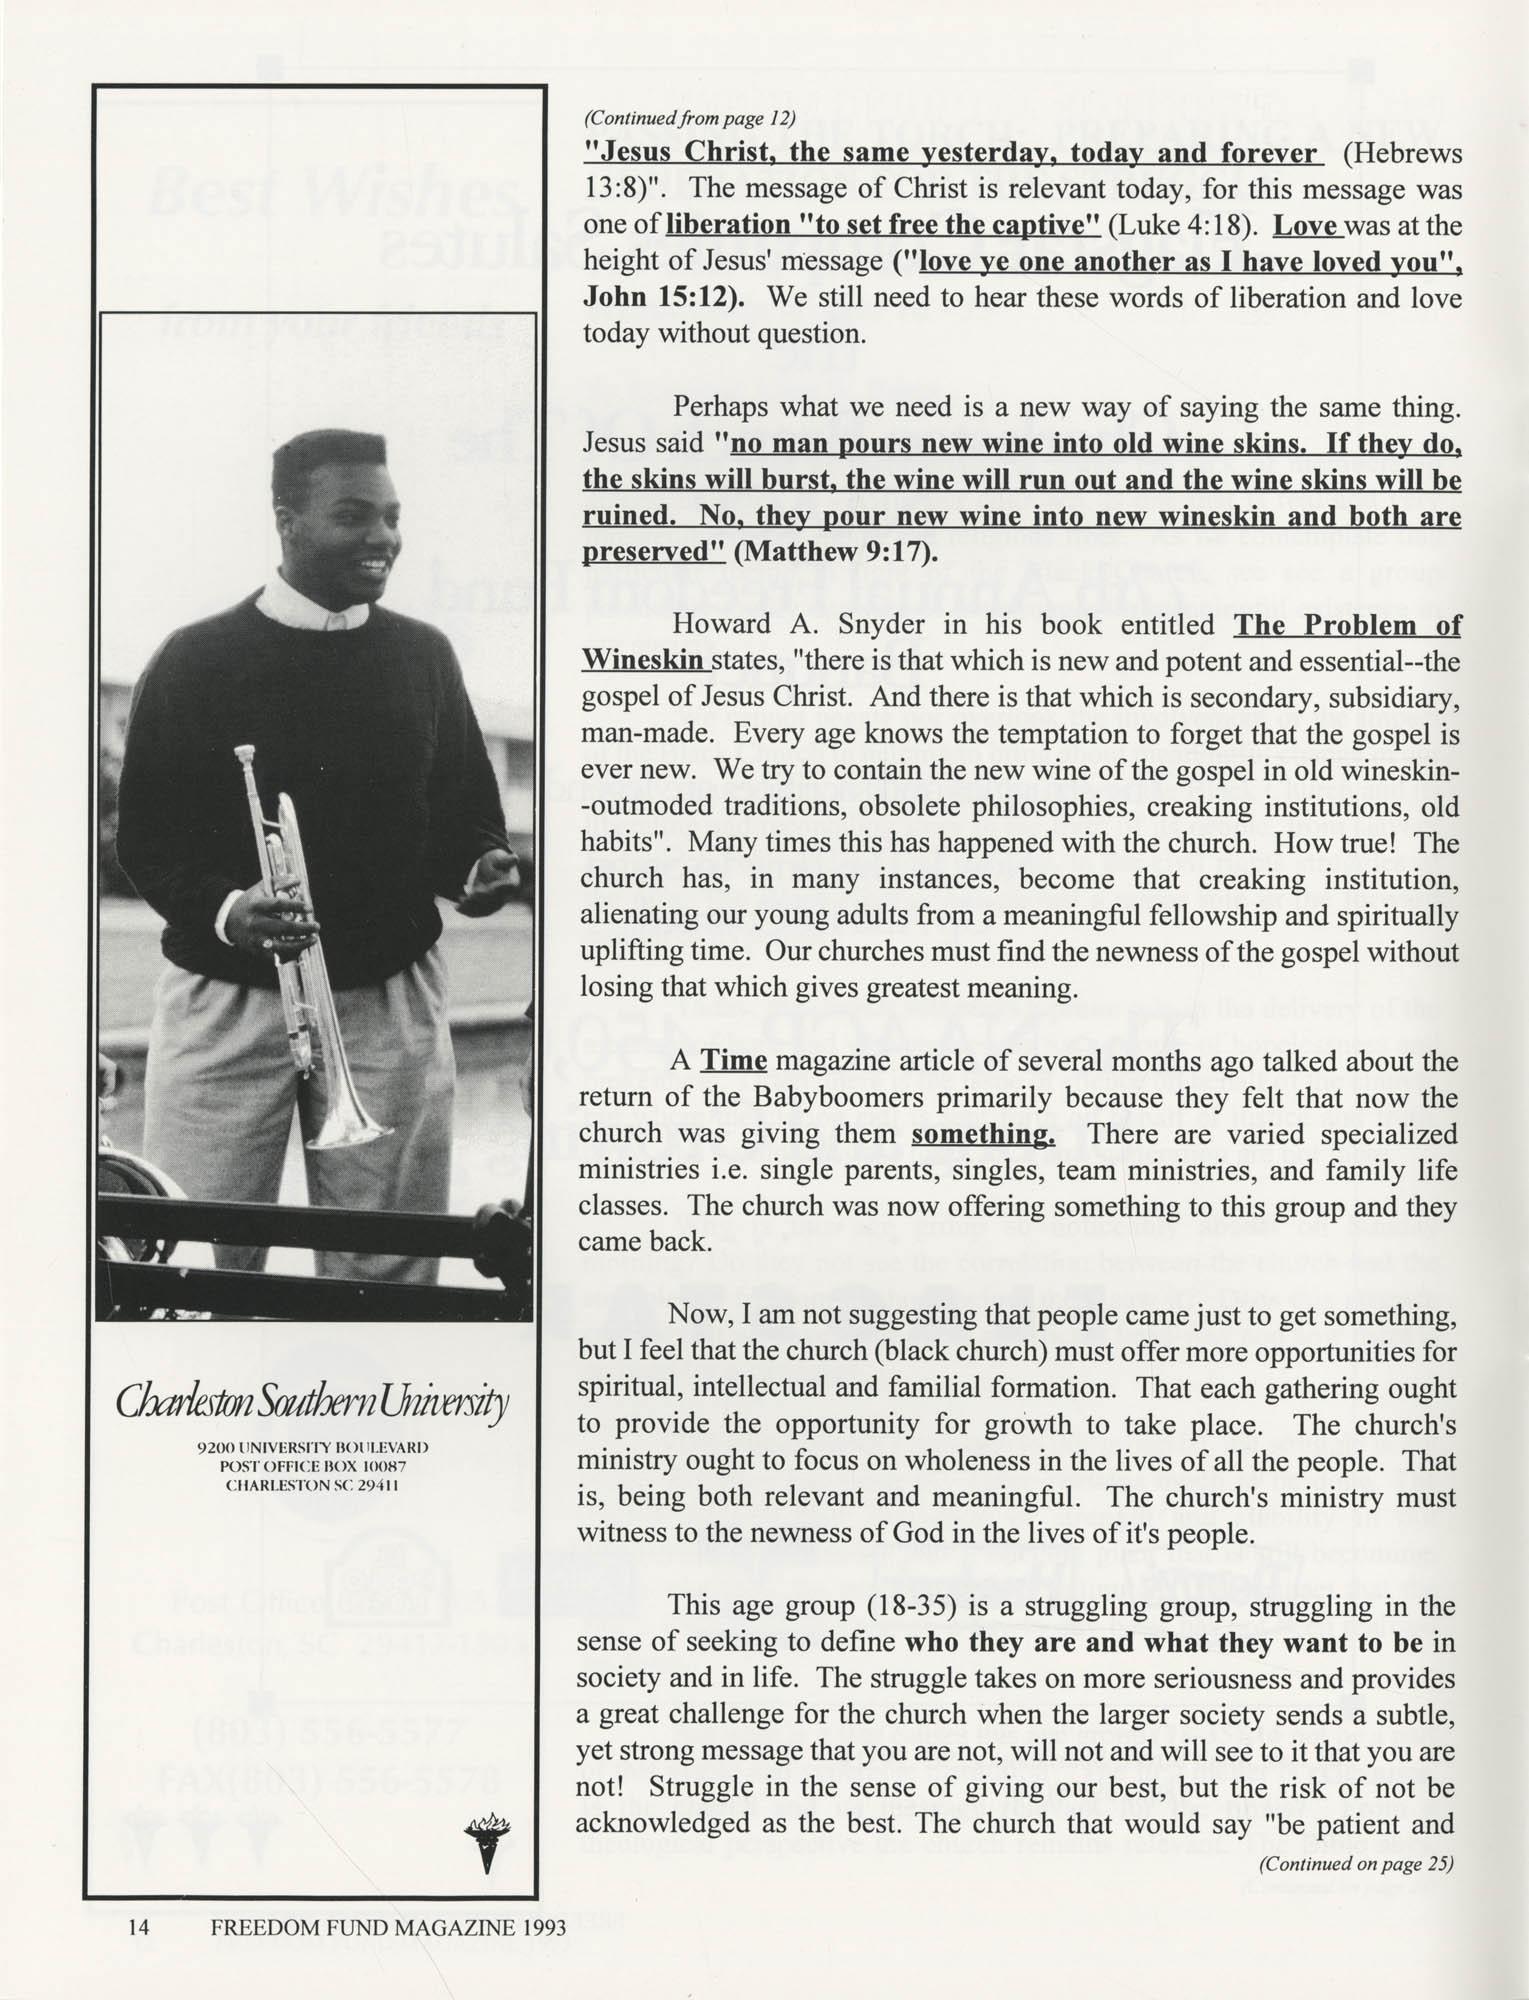 Freedom Fund Magazine, 1993, Page 14